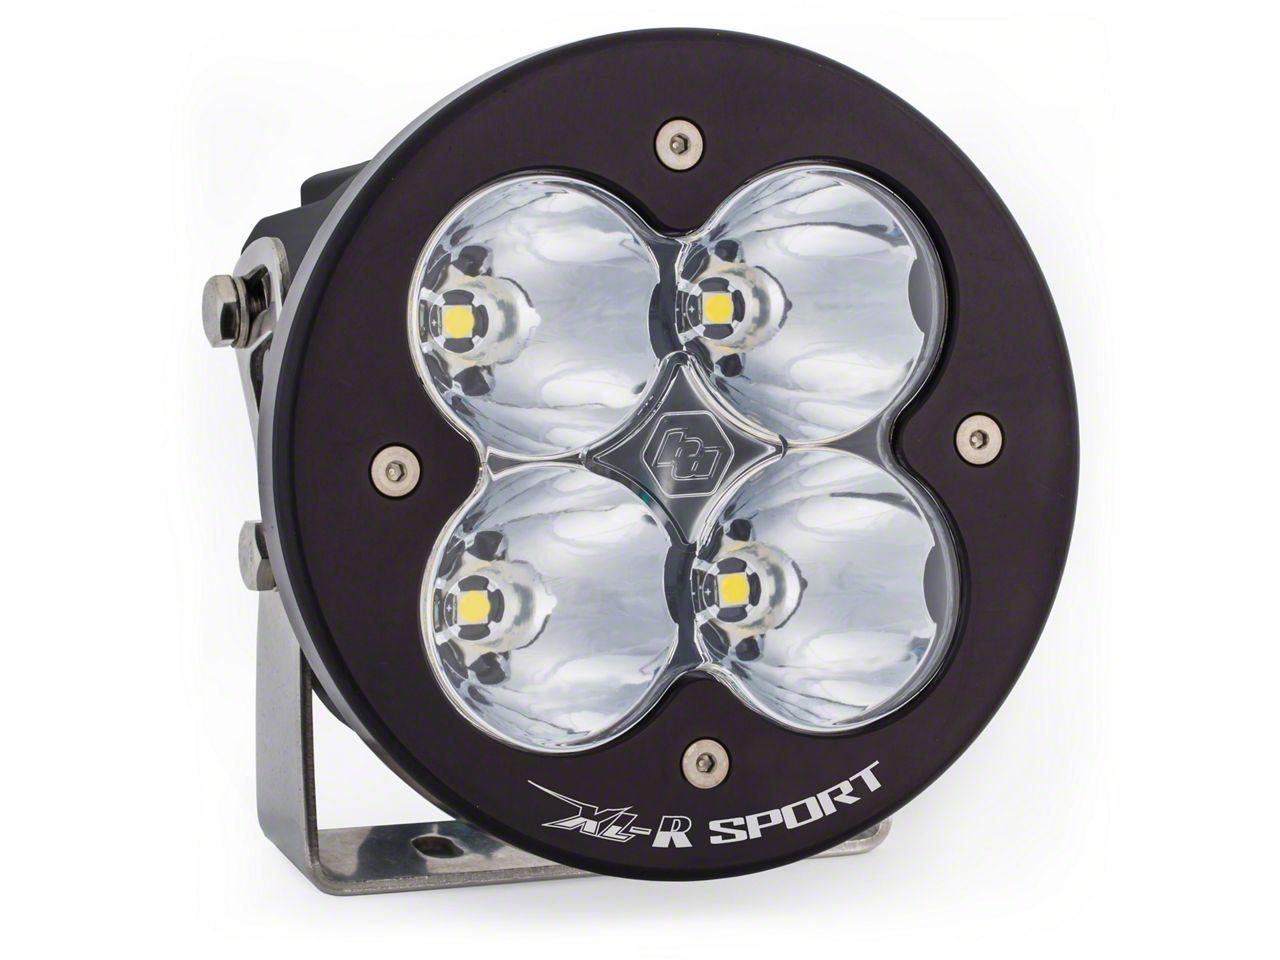 Baja Designs XL-R Sport LED Light - High Speed Spot Beam